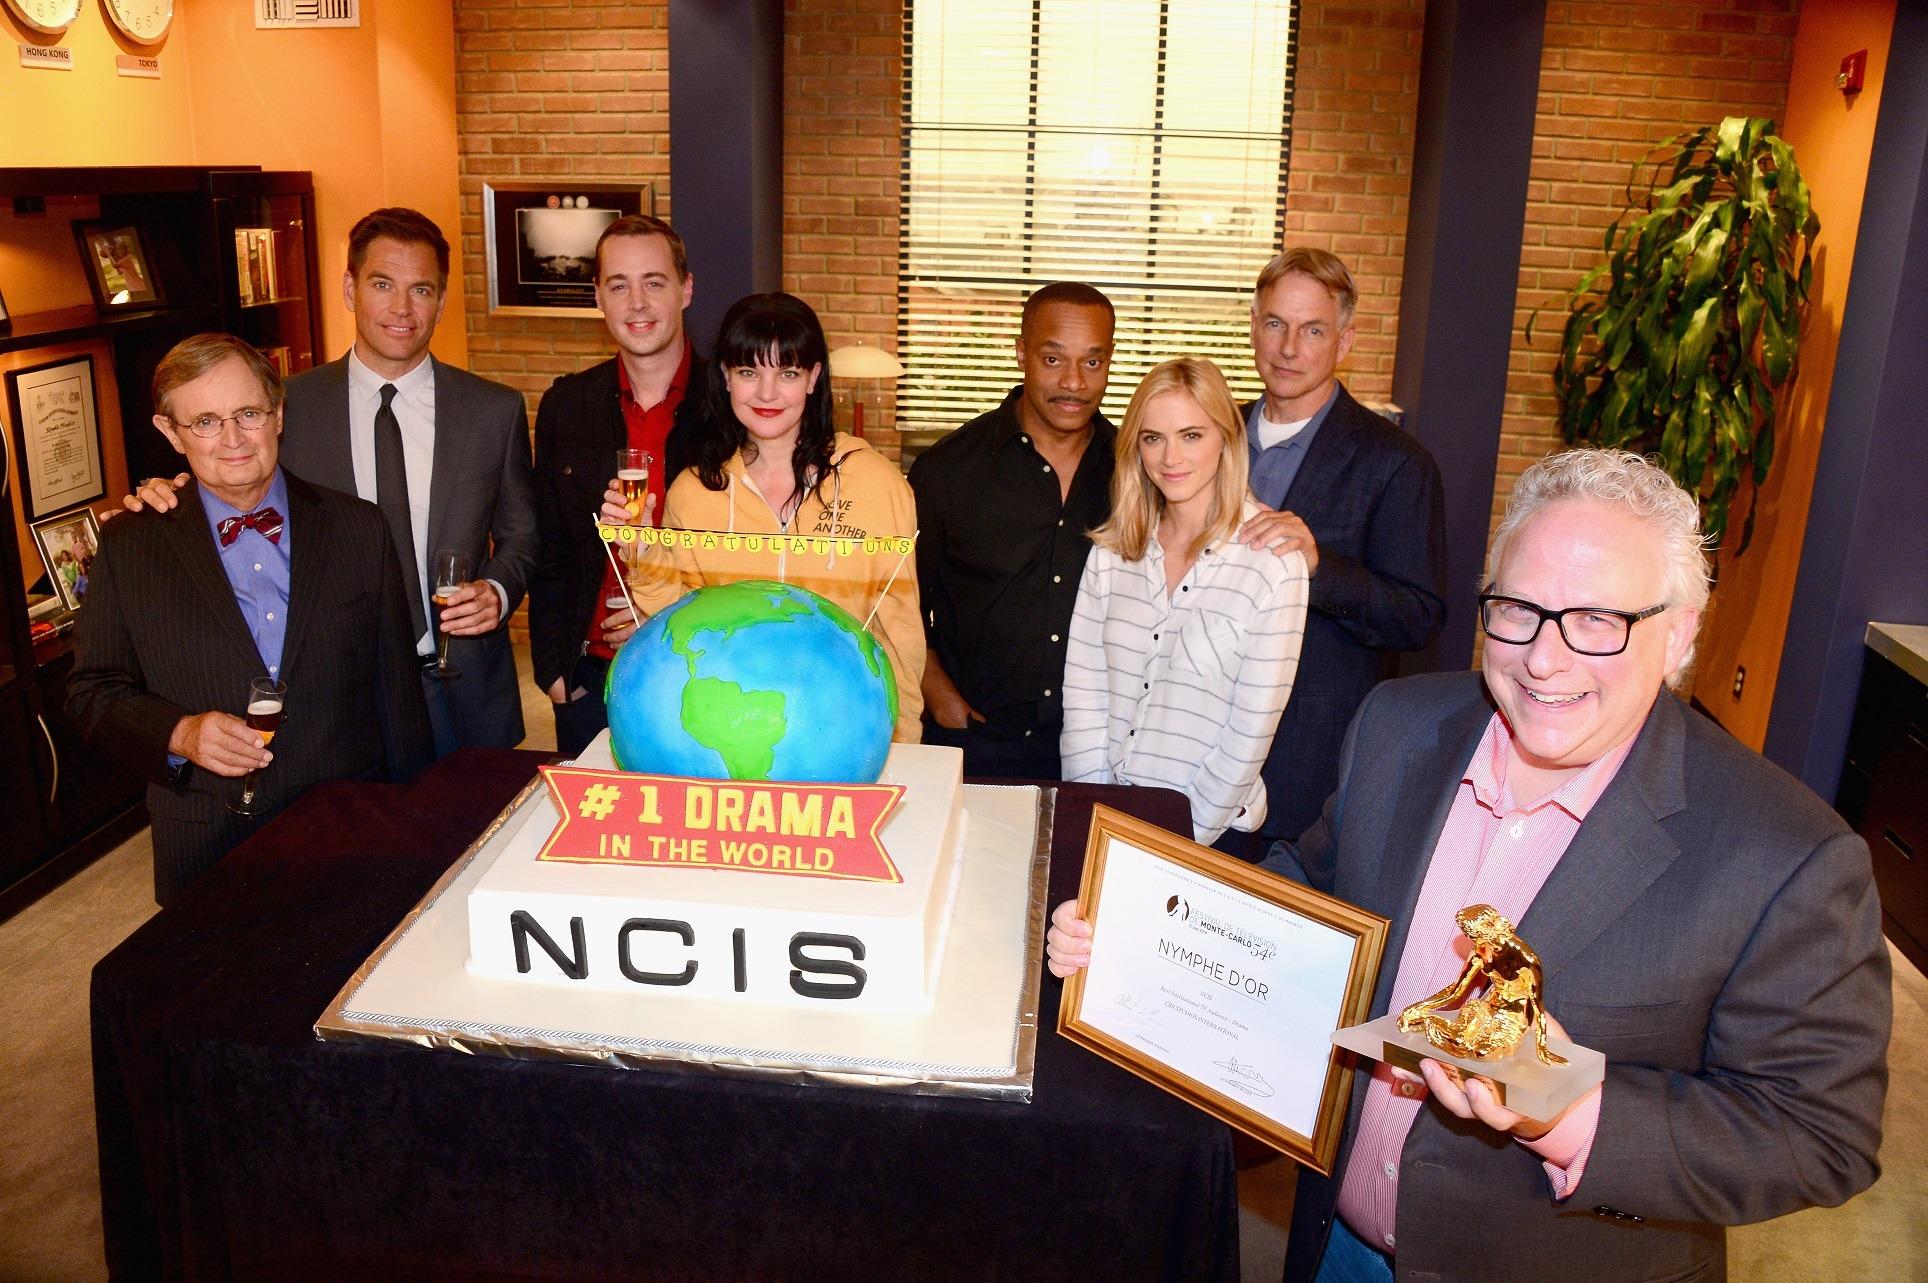 David McCallum (left) and the cast of NCIS.